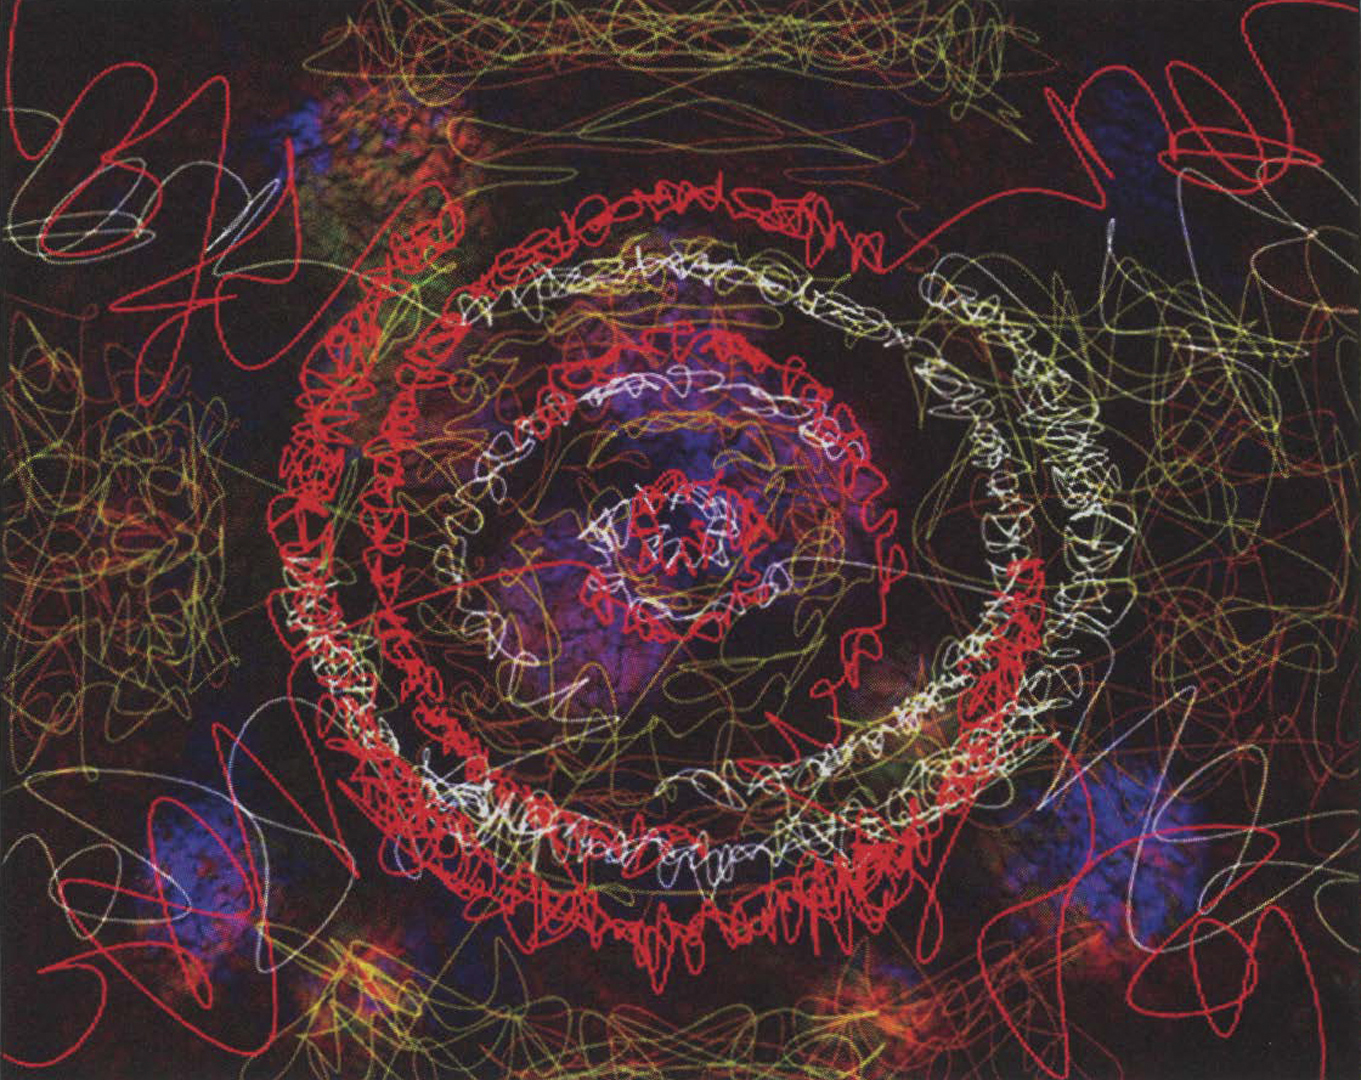 ©2004, Vivek Patel, Superimposing Fo  Upon Chaos